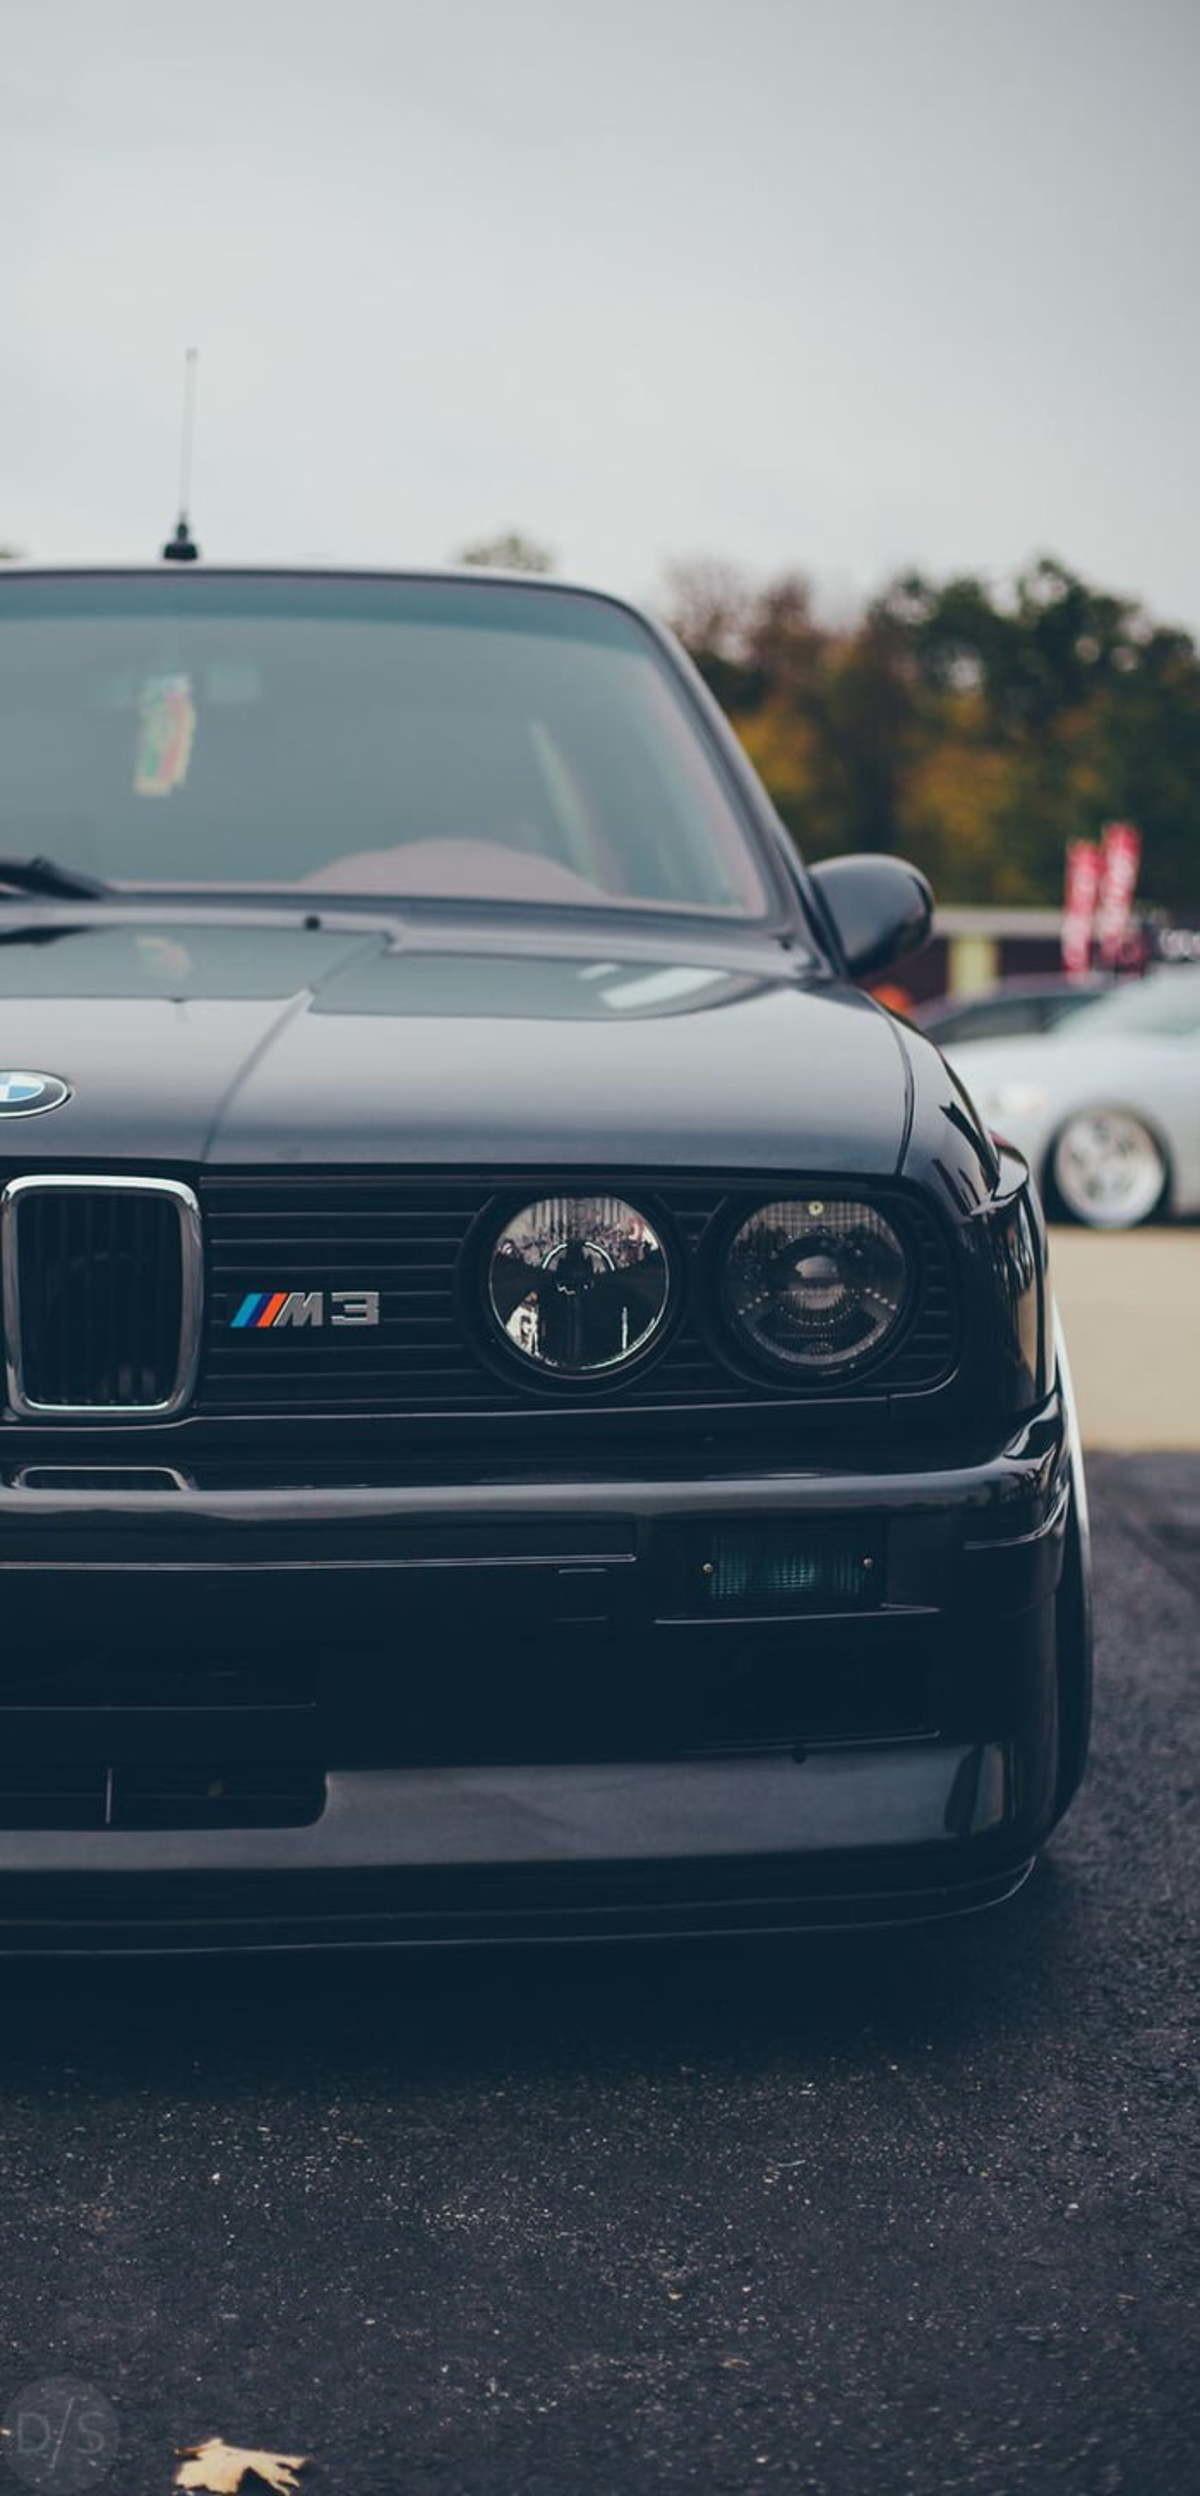 BMW E30 M3. .. I drive an F87 M2c, I likes bimmers